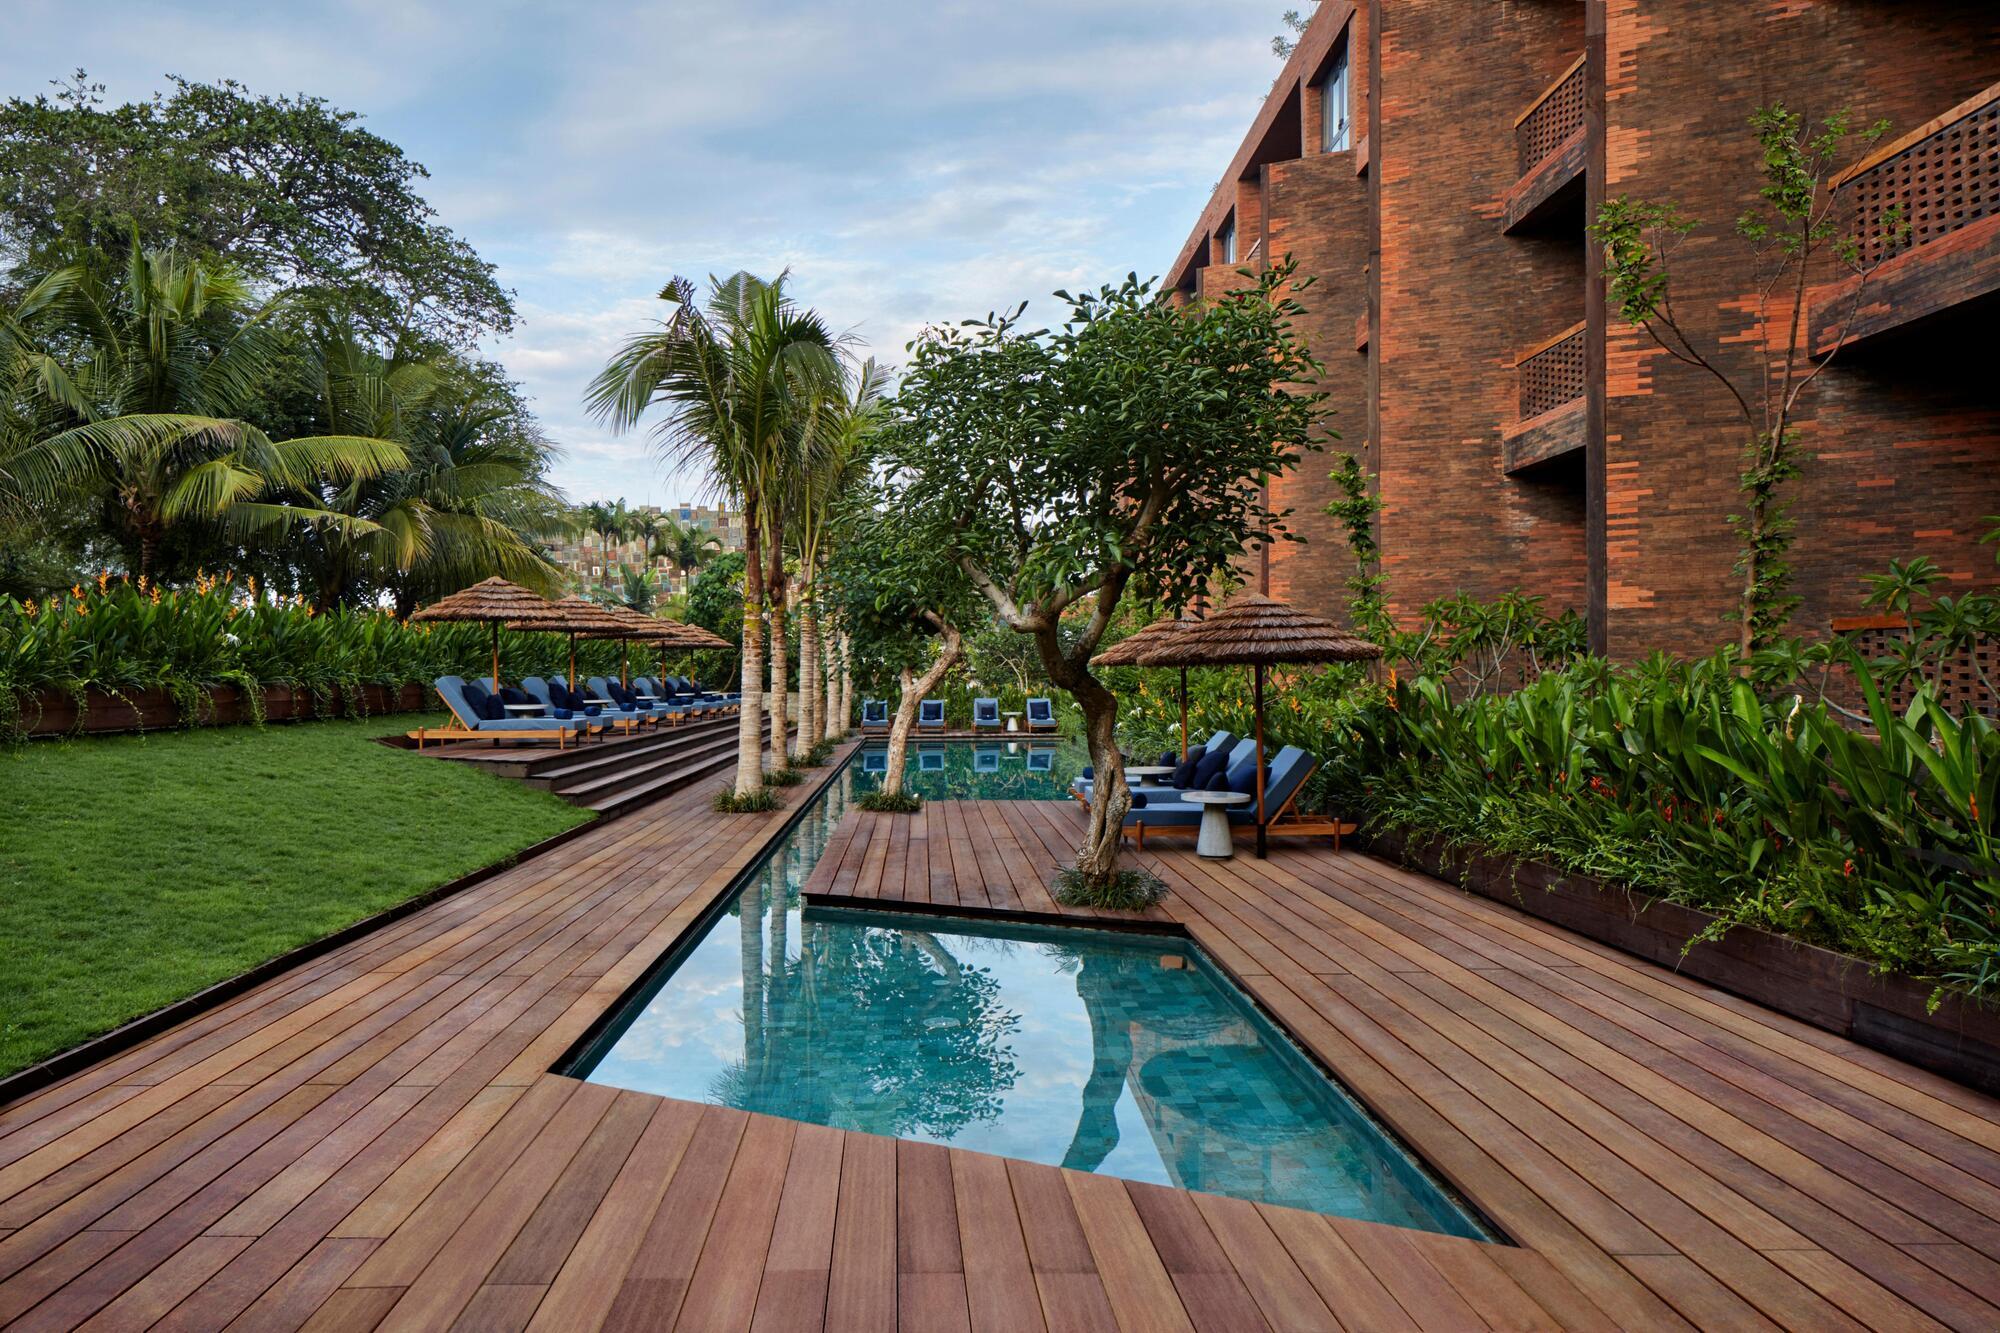 Katamana Hotel, Seminyak, Bali Image 0